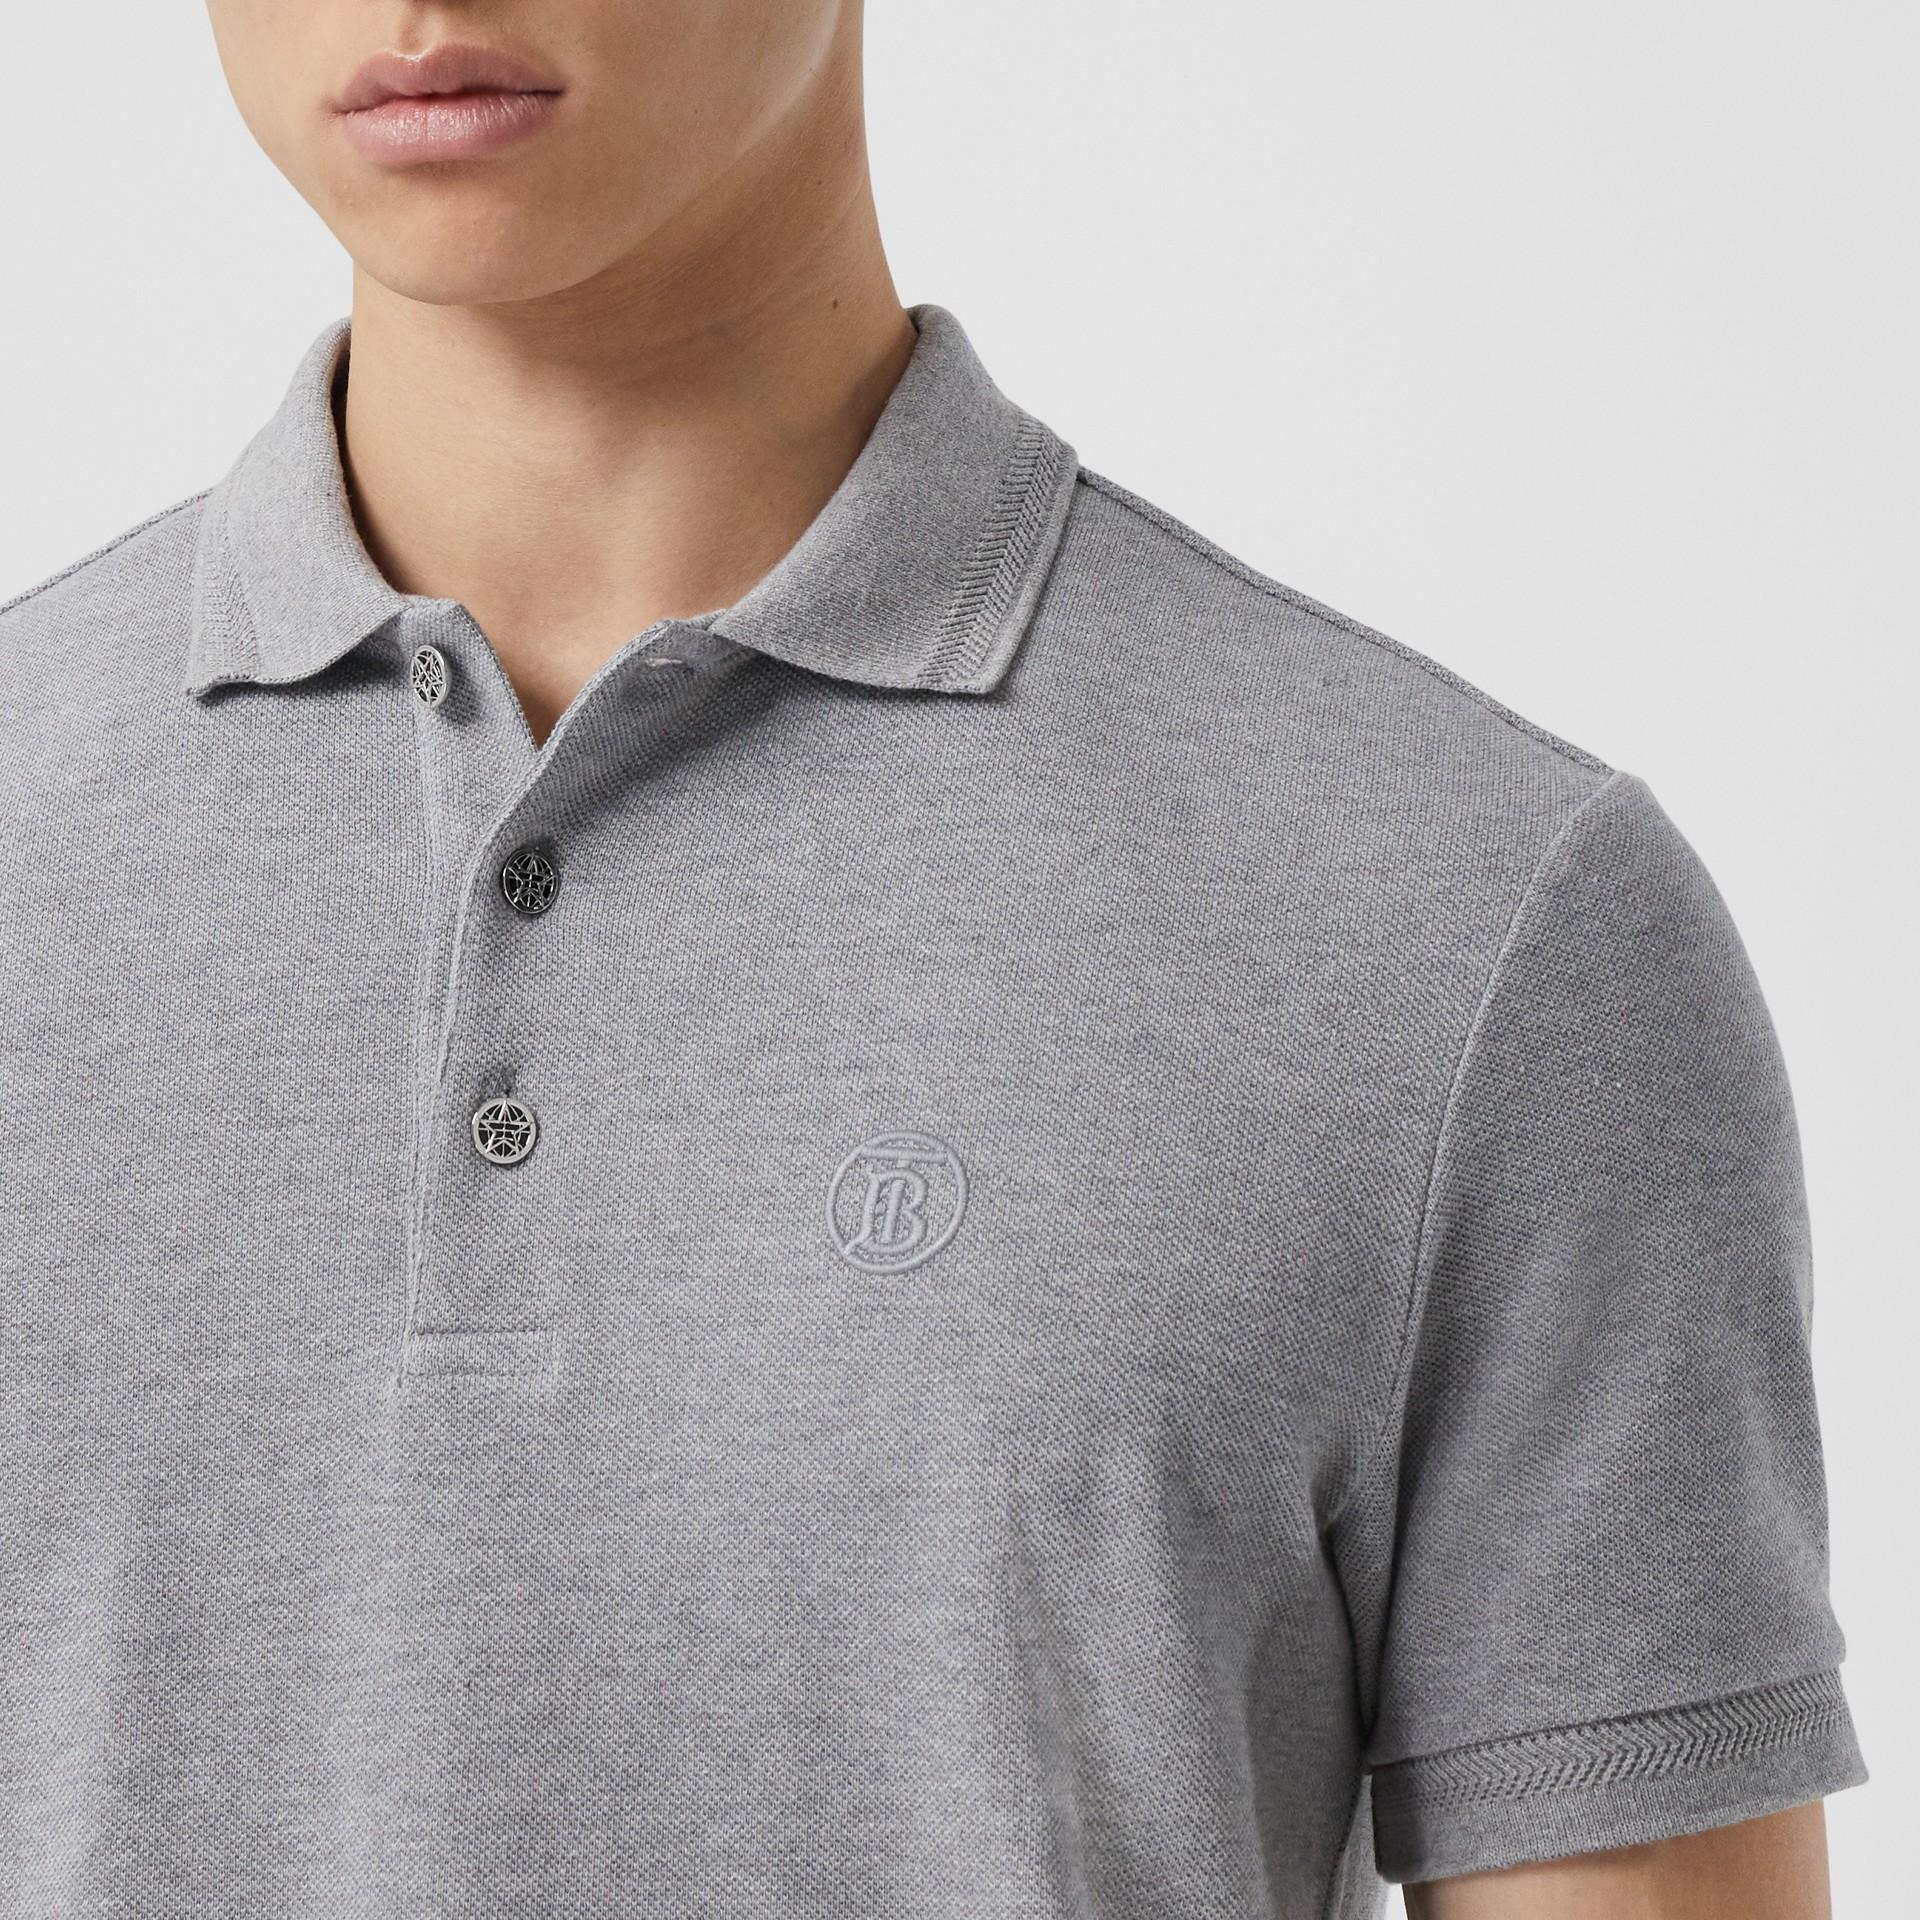 Button Detail Cotton Piqué Polo Shirt in Pale Grey Melange - Men | Burberry Canada - gallery image 1